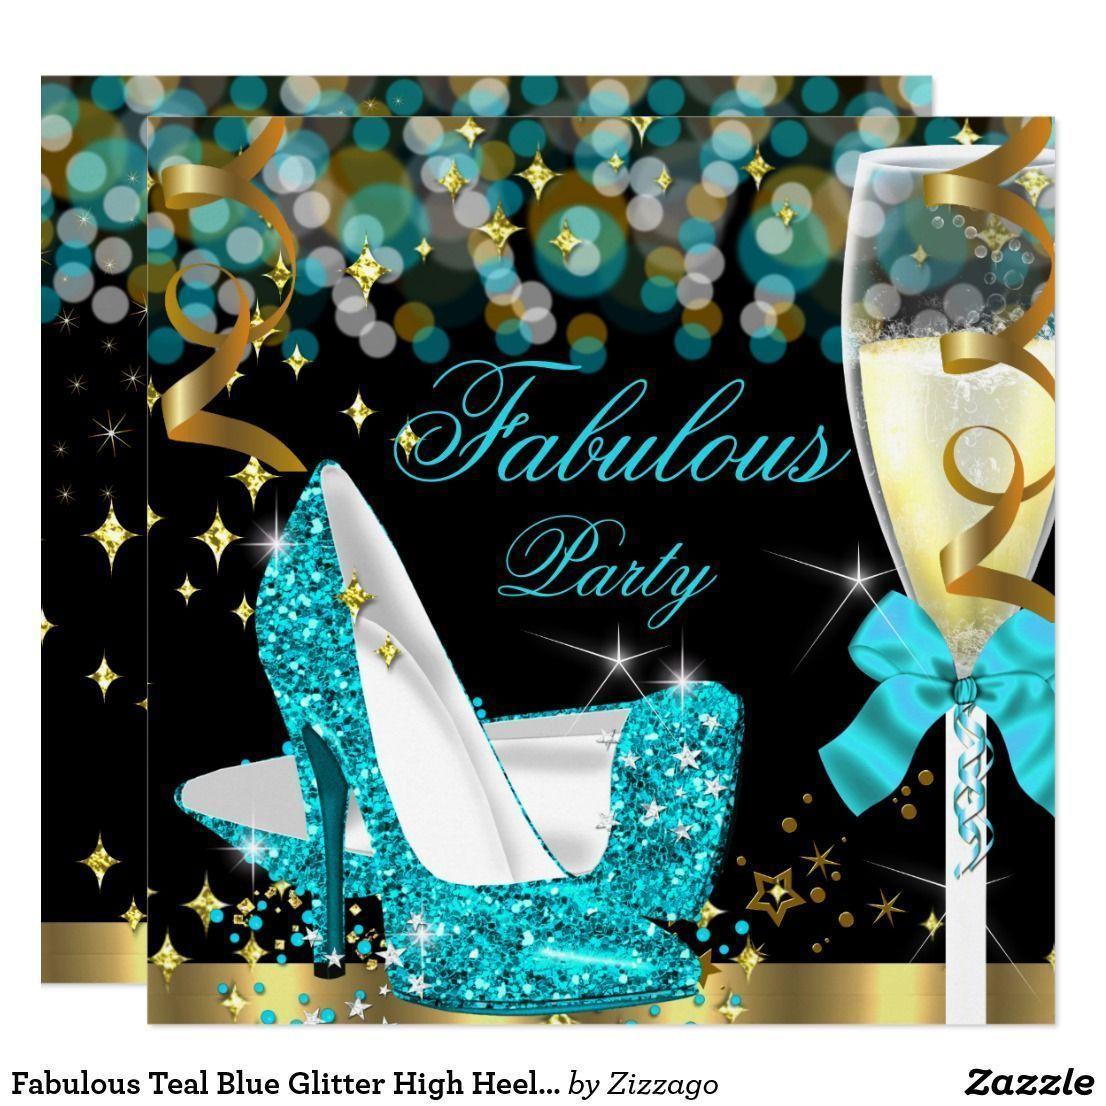 Teal Iphone Wallpaper: Fabulous Teal Blue Glitter High Heel Birthday 2 Card